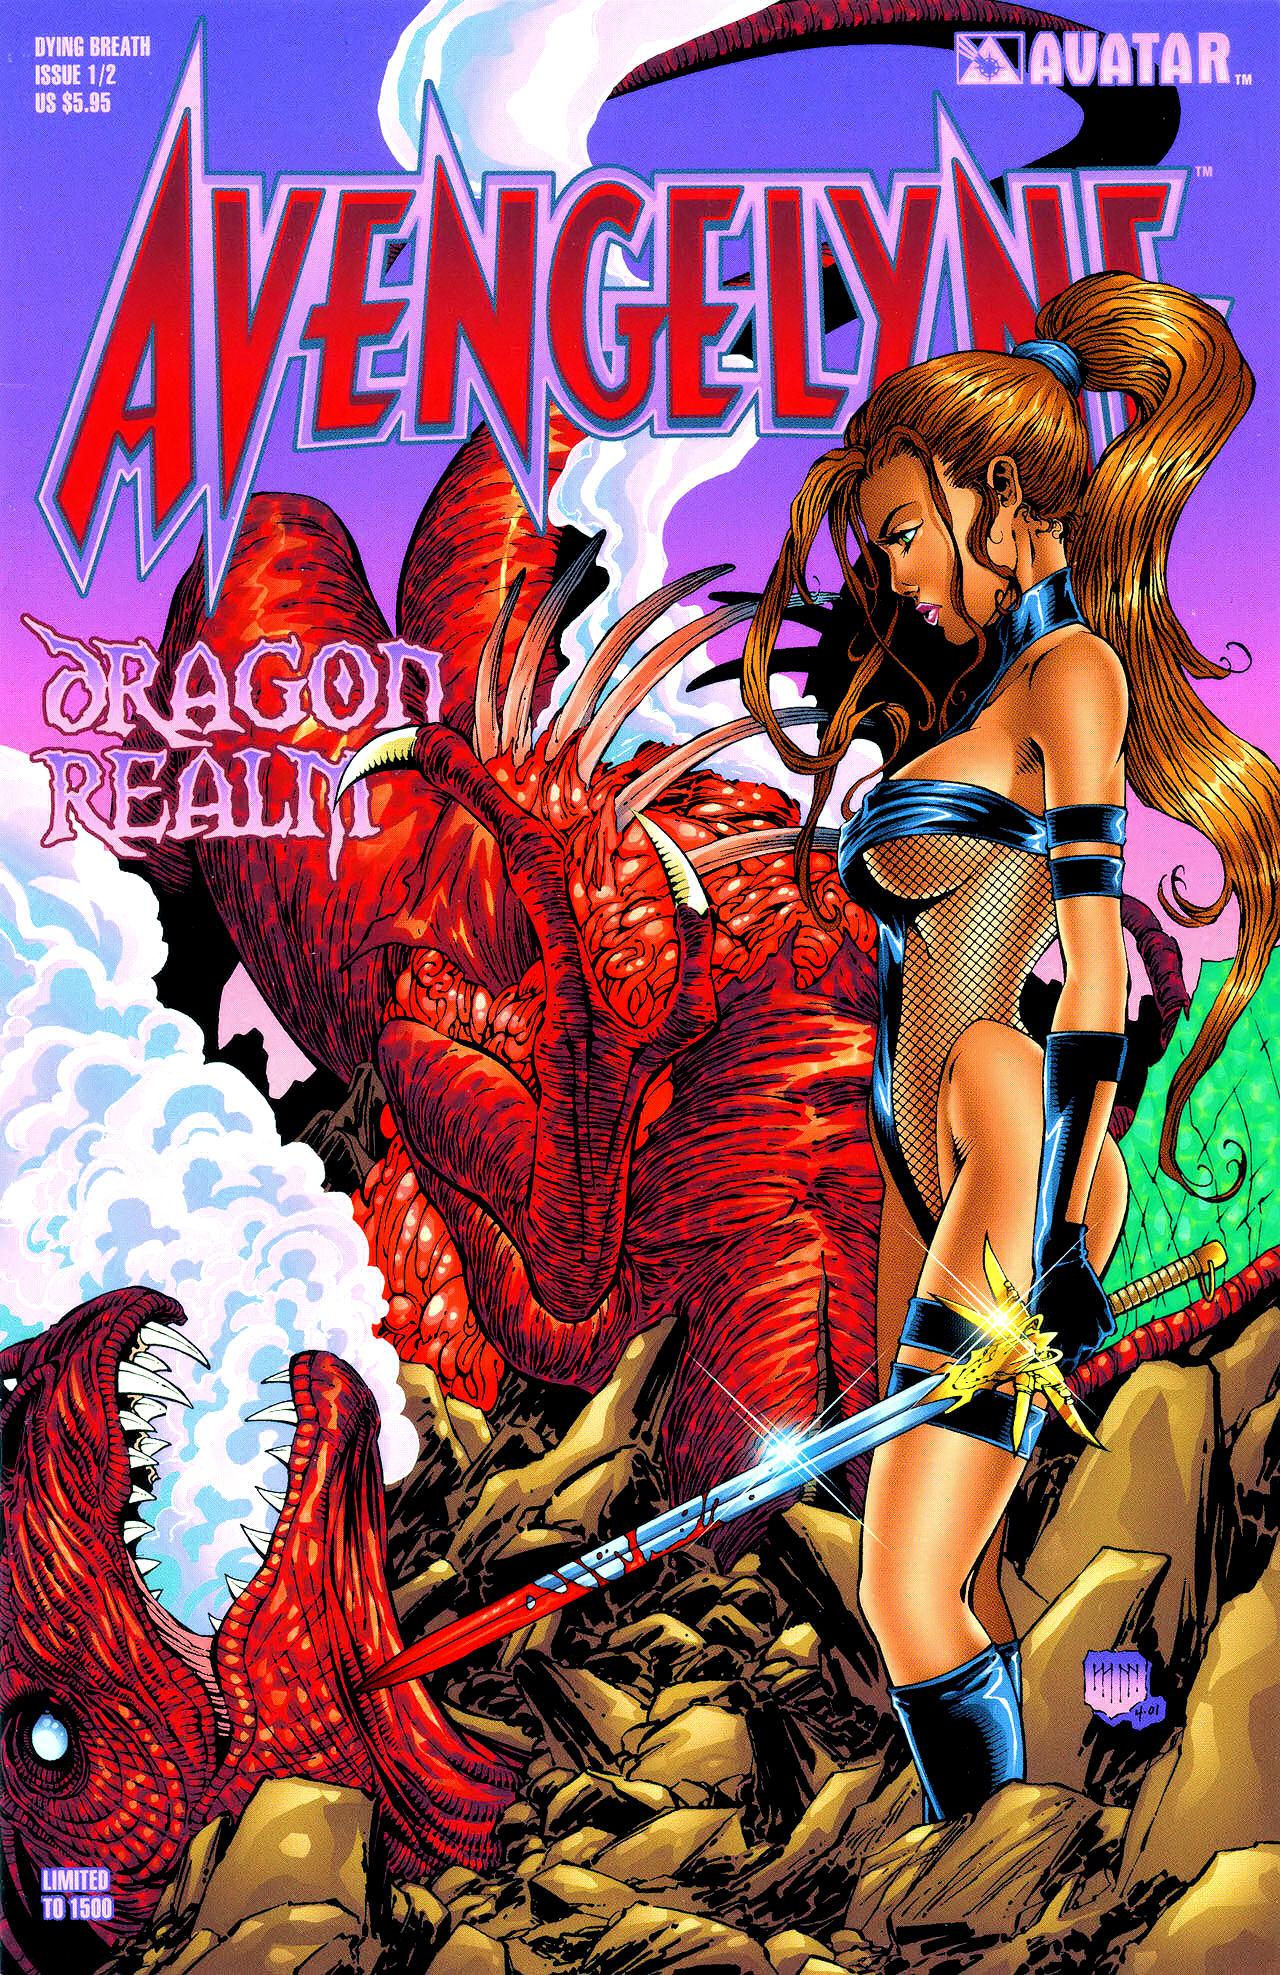 Read online Avengelyne: Dragon Realm comic -  Issue #0.5 - 4